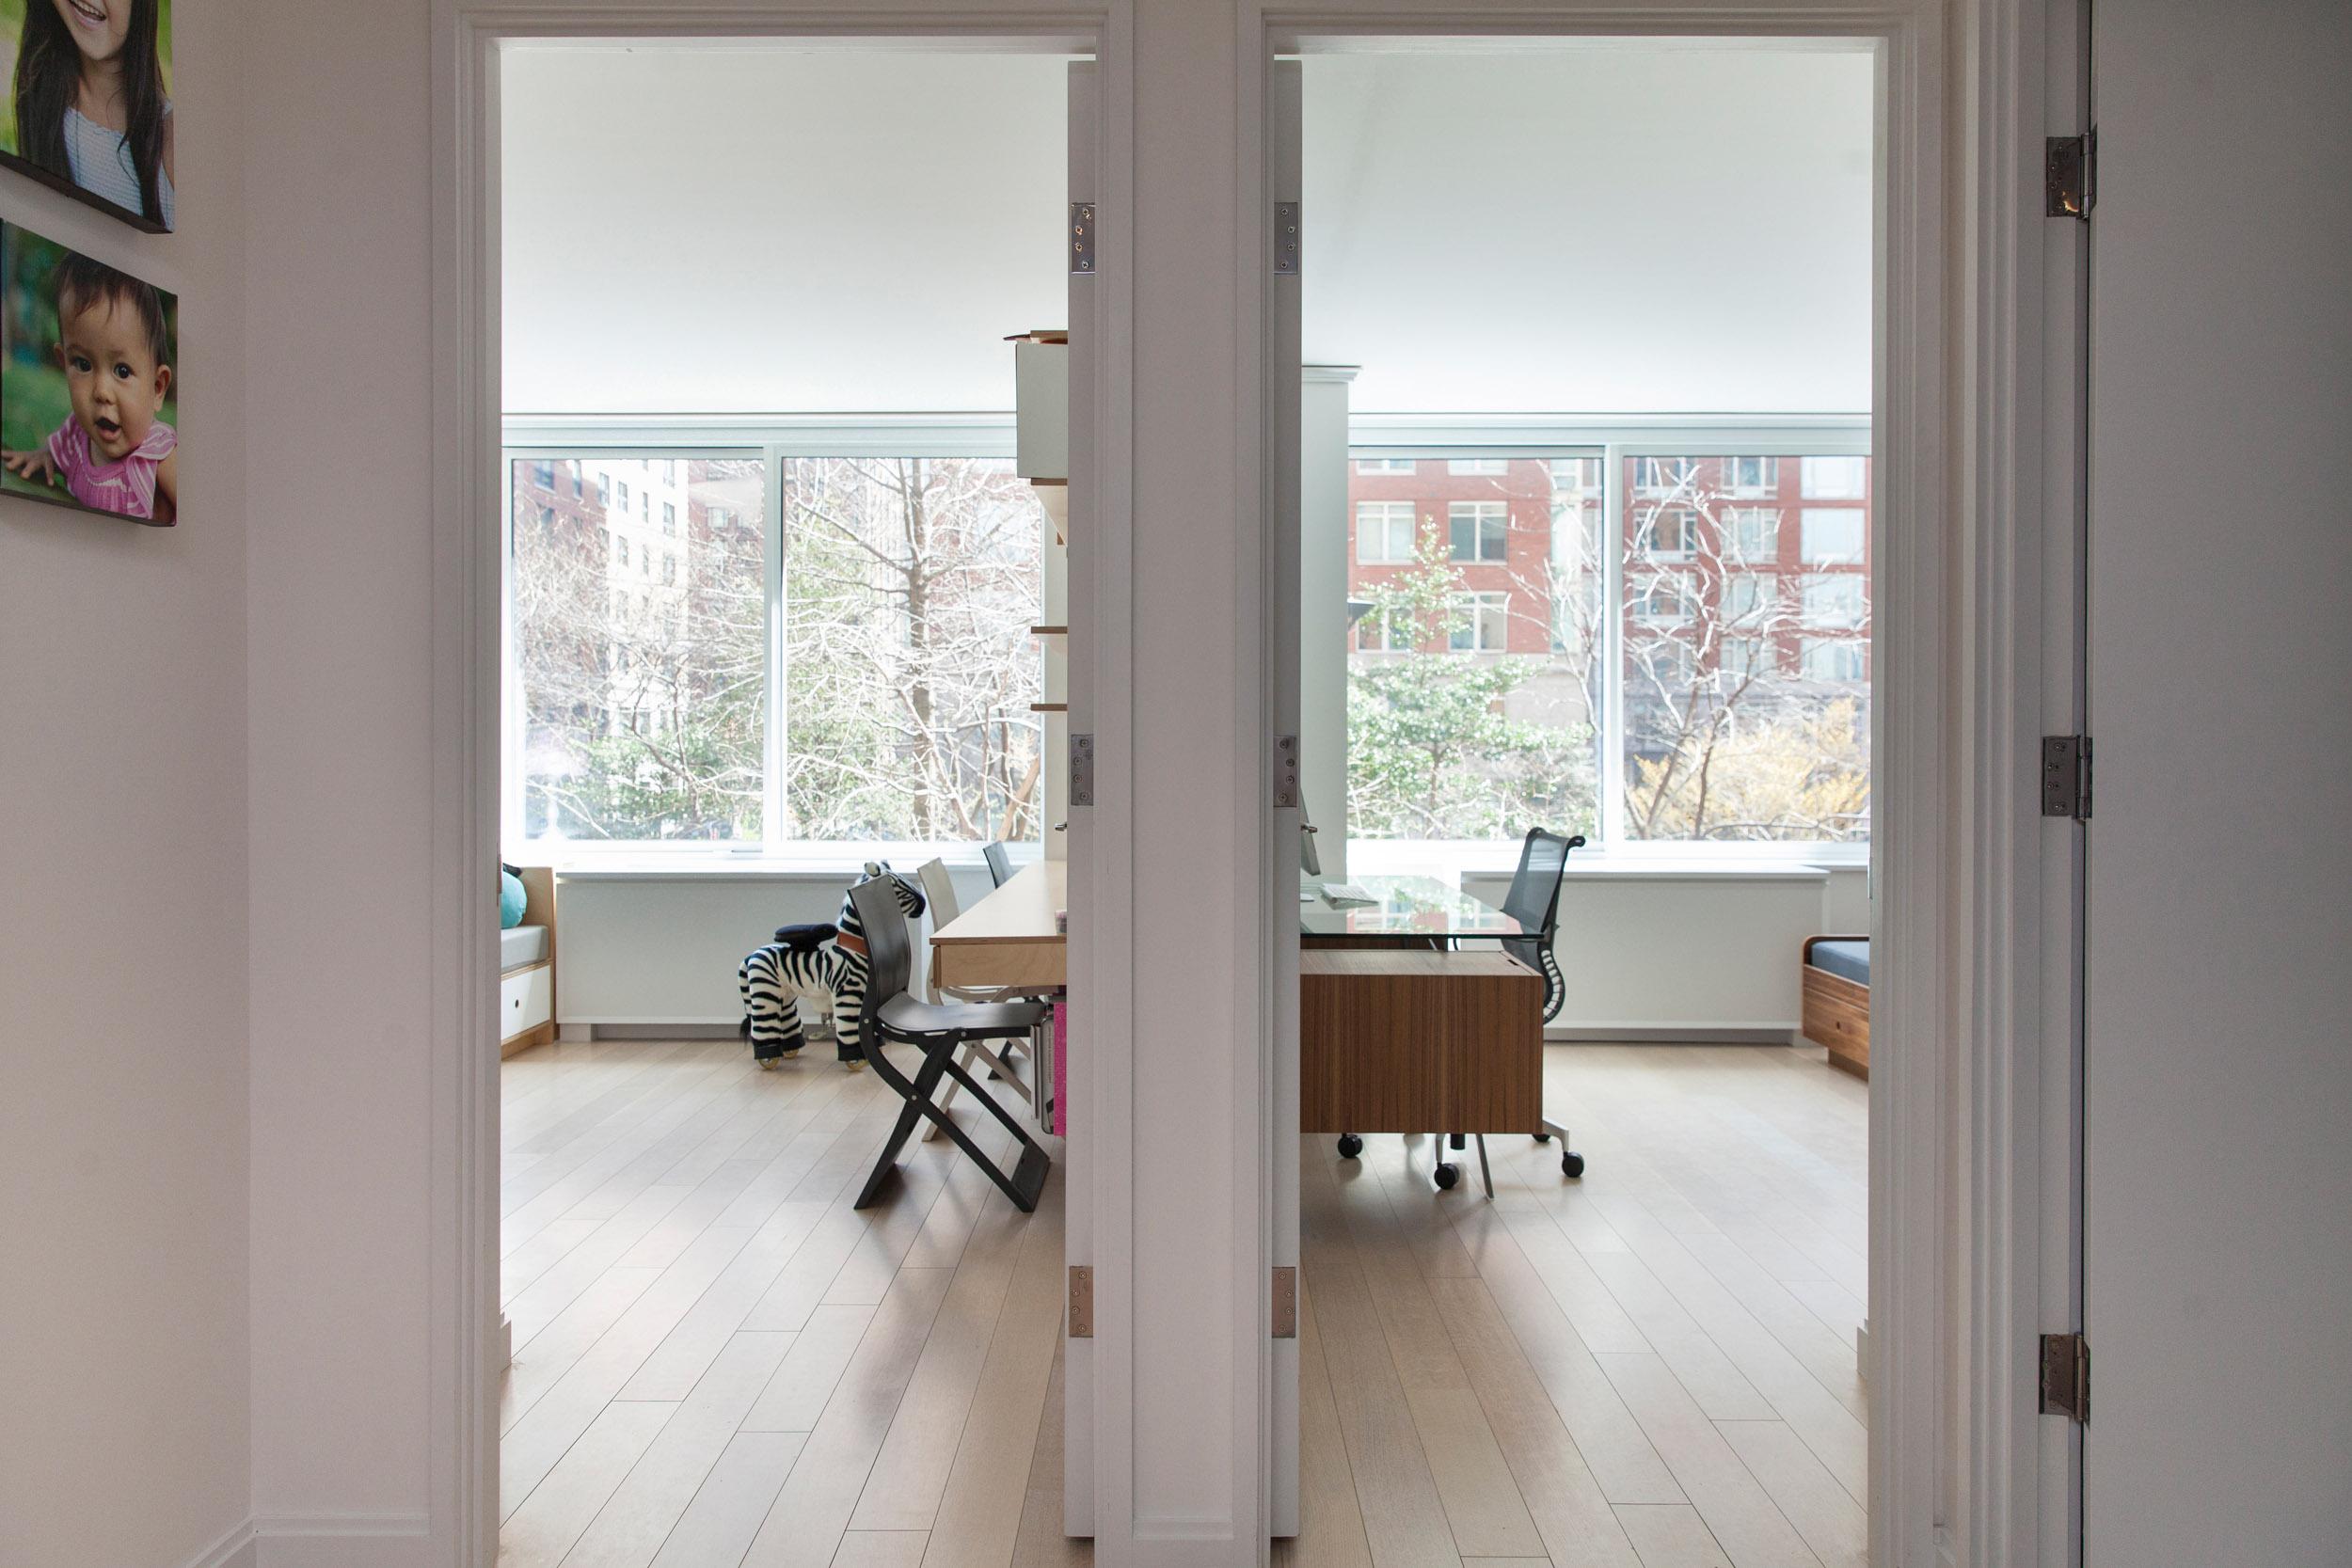 Casa Kids home office furniture